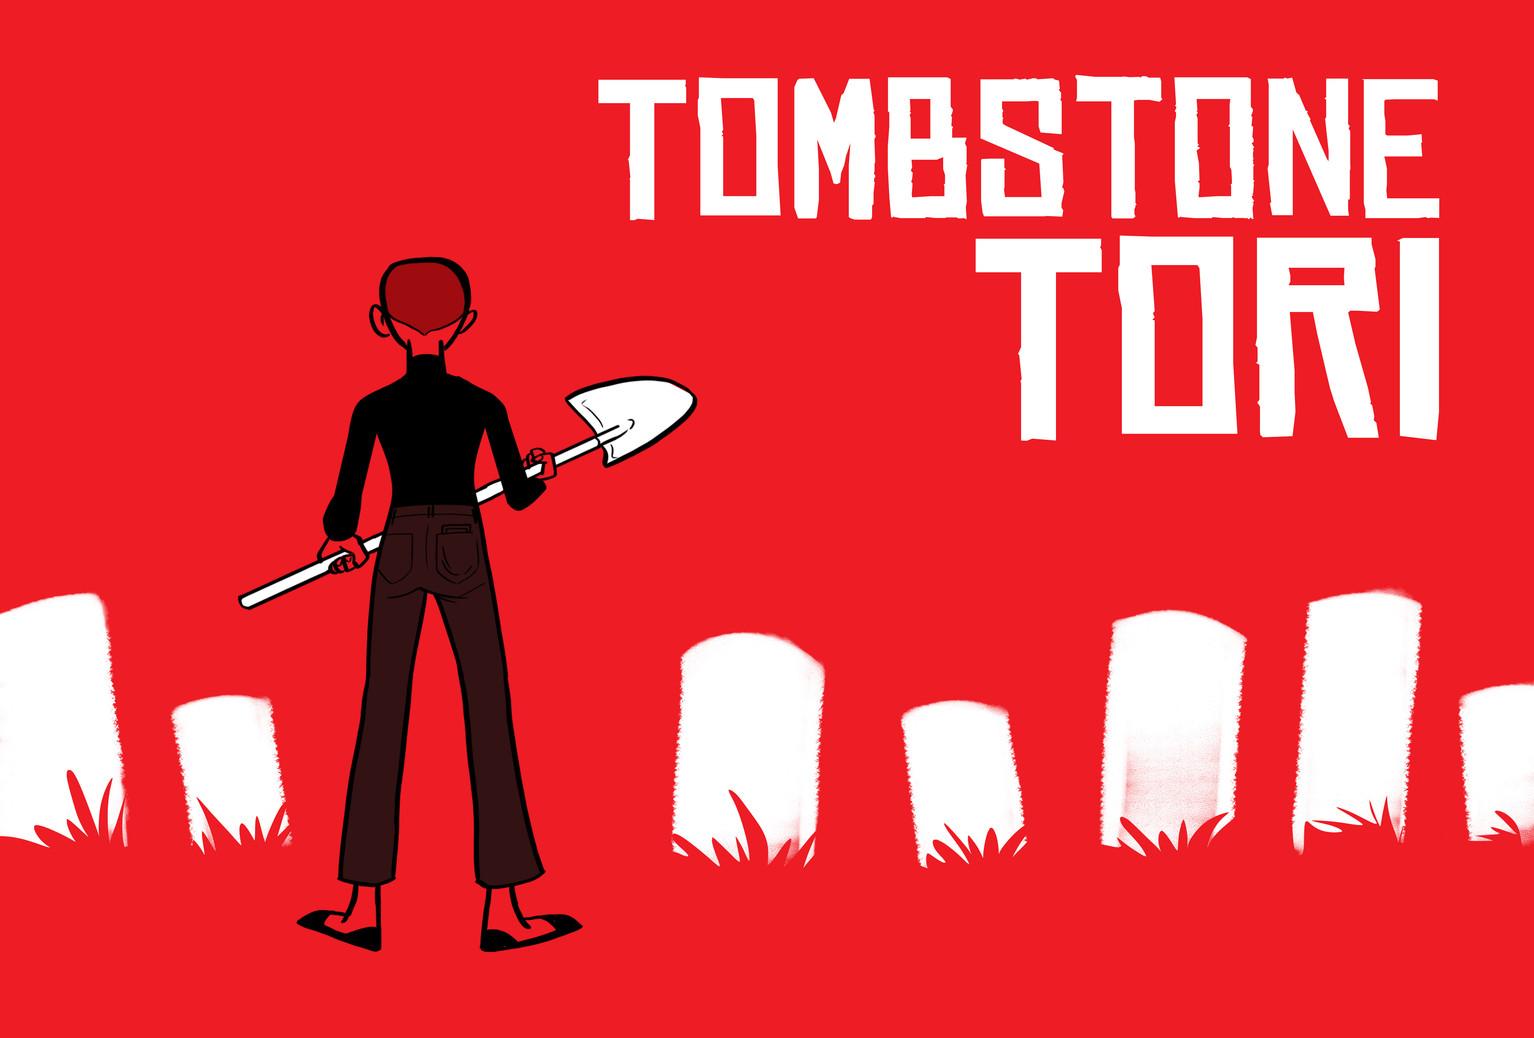 Tombstone Tori_COVER.jpg